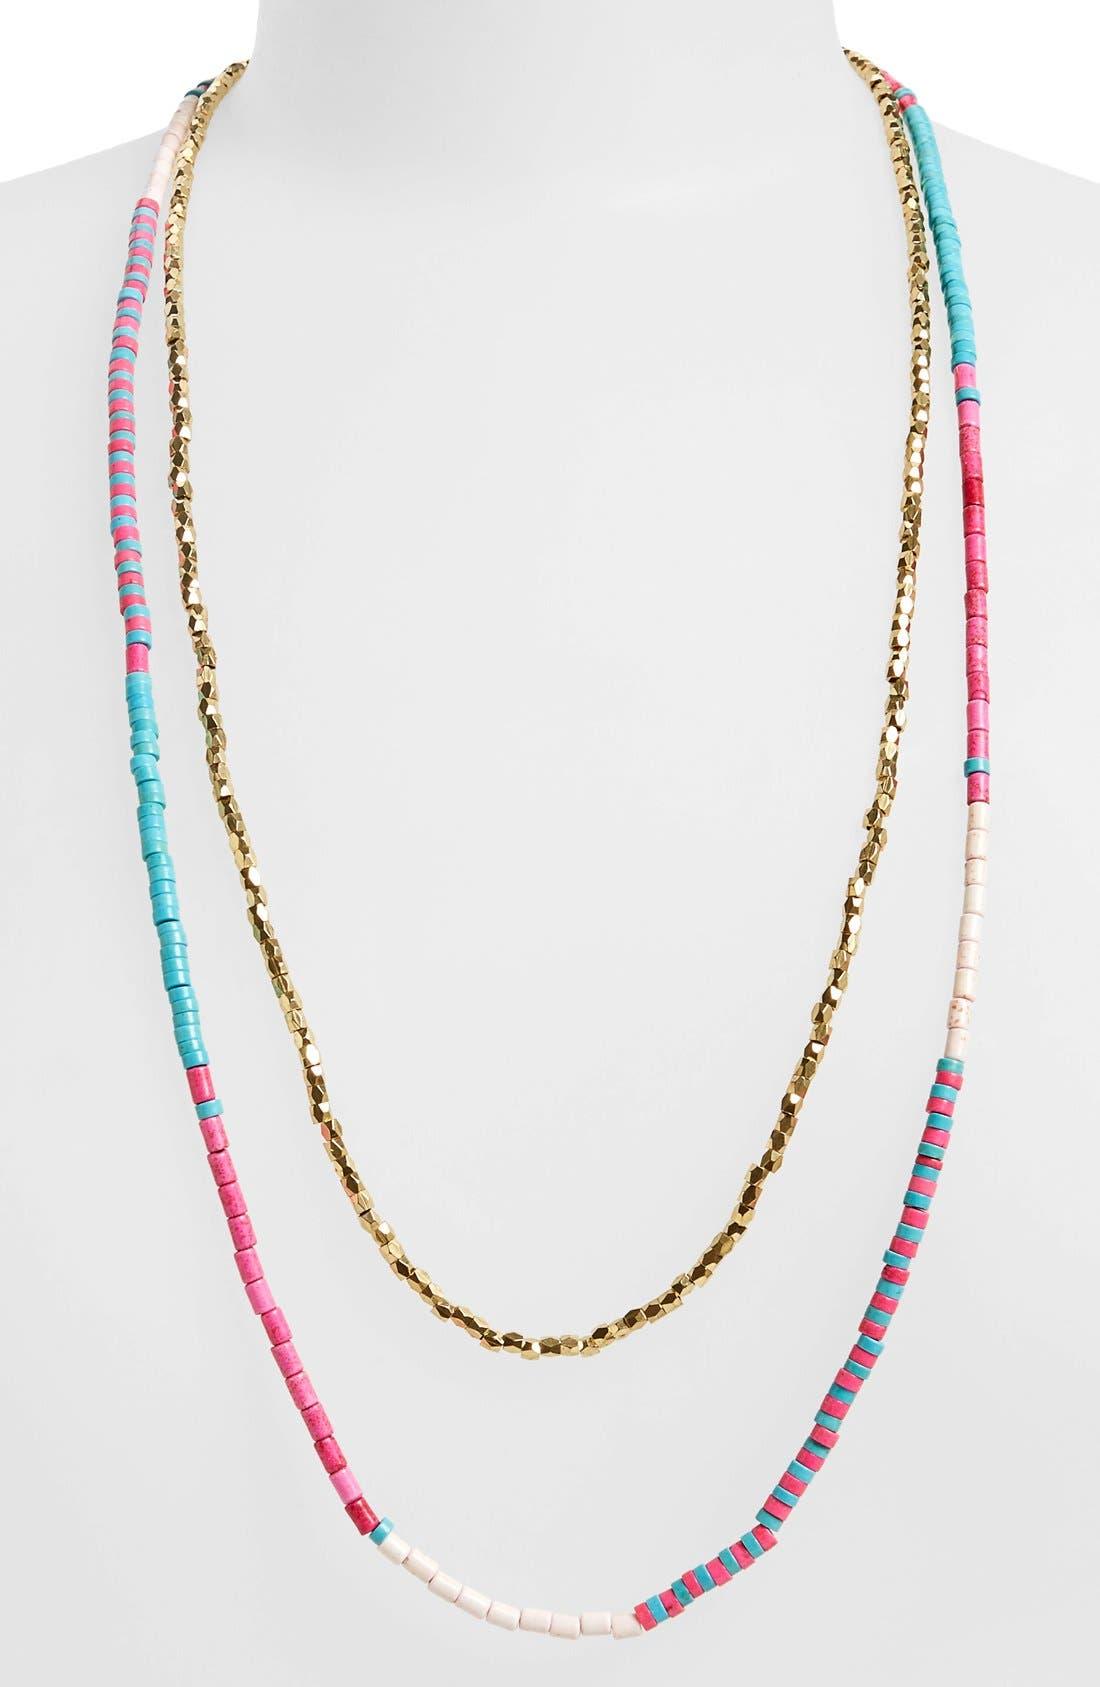 Main Image - Panacea Beaded Multistrand Necklace